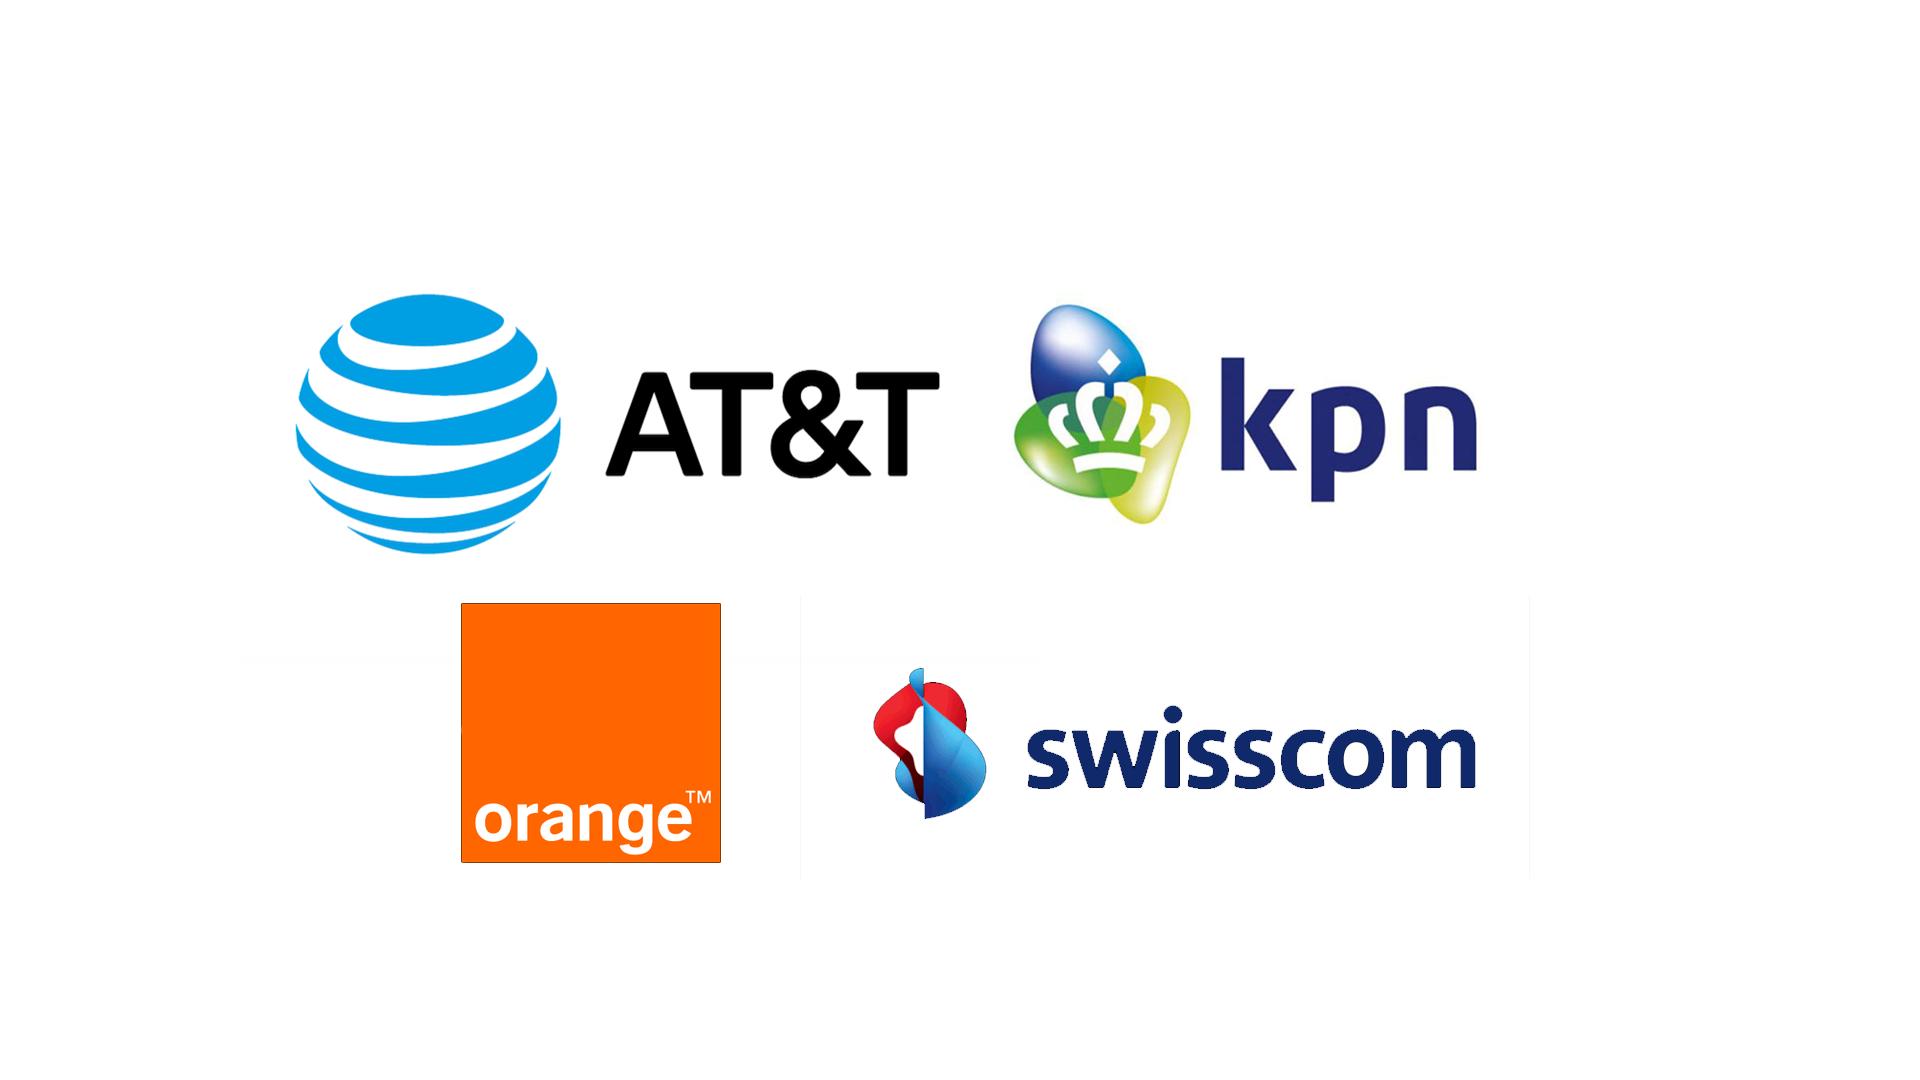 Logos swisscom att orange kpn